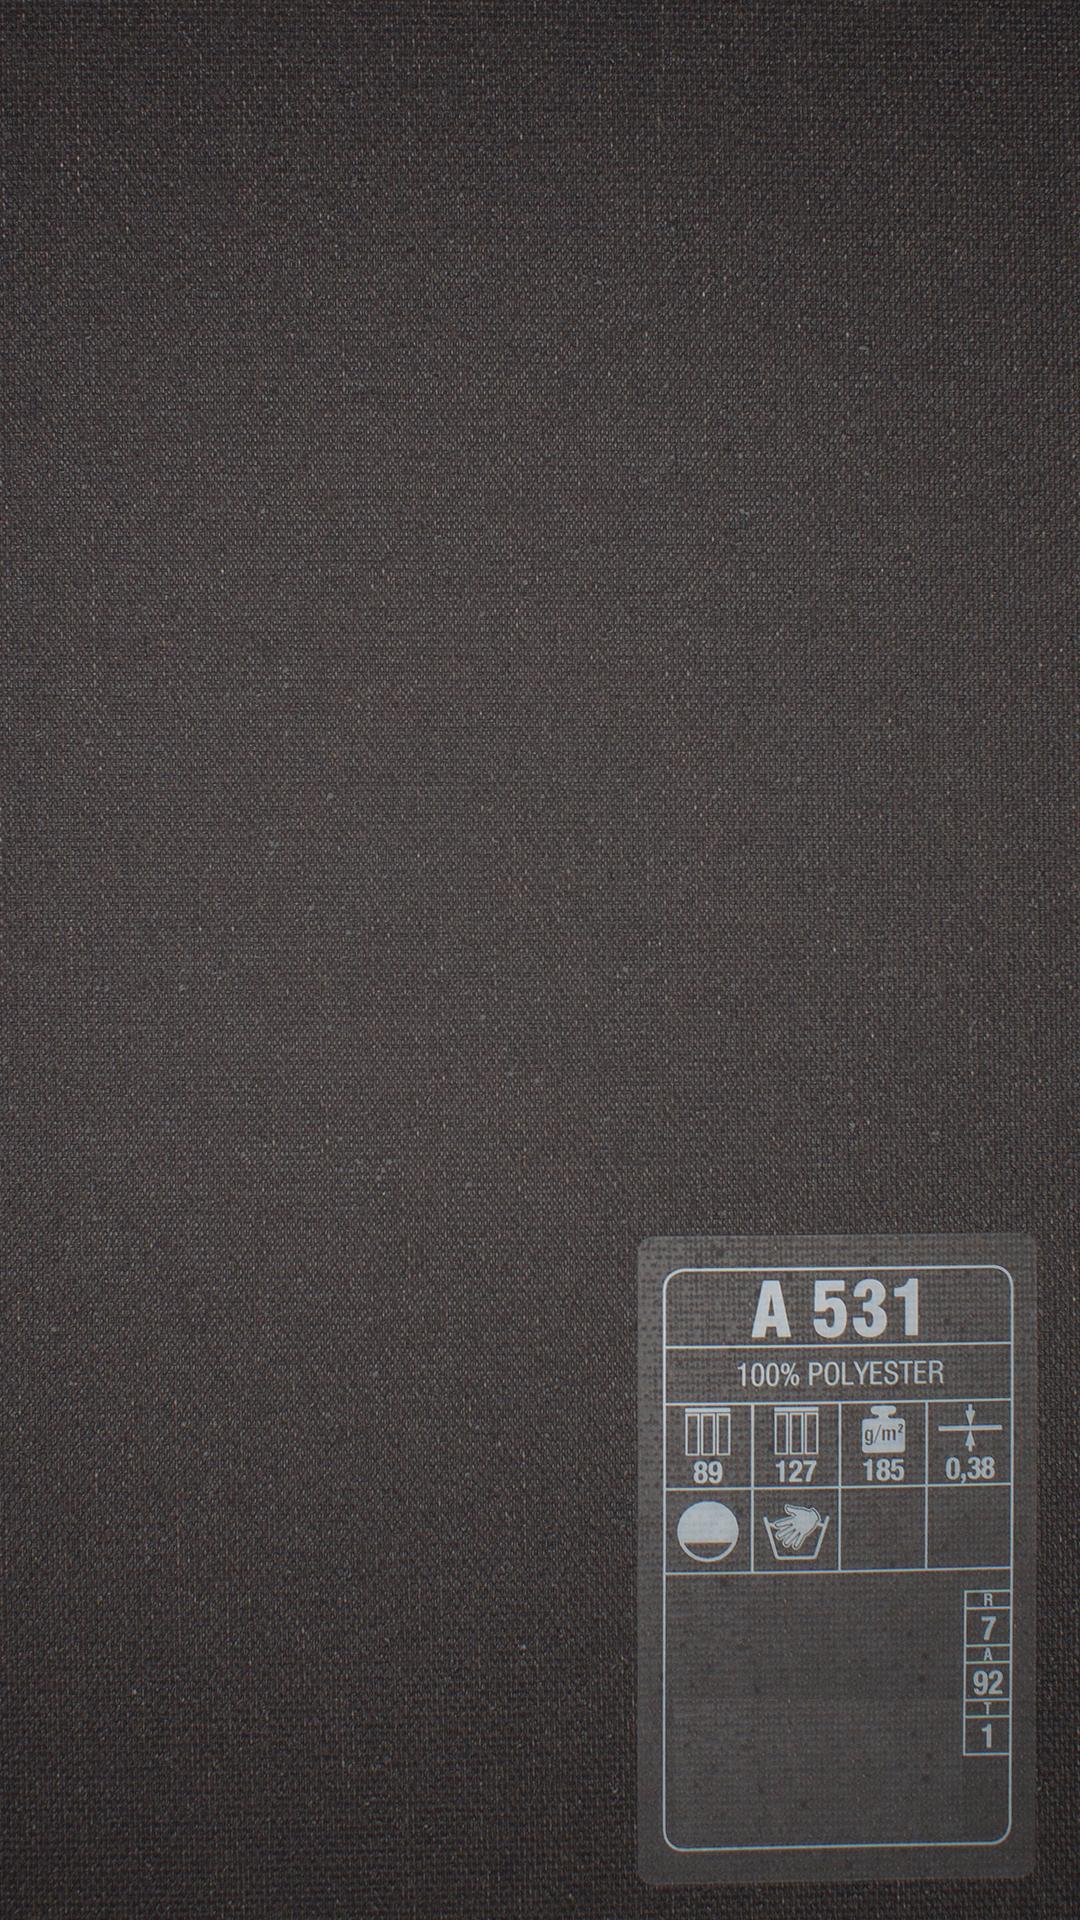 A 531